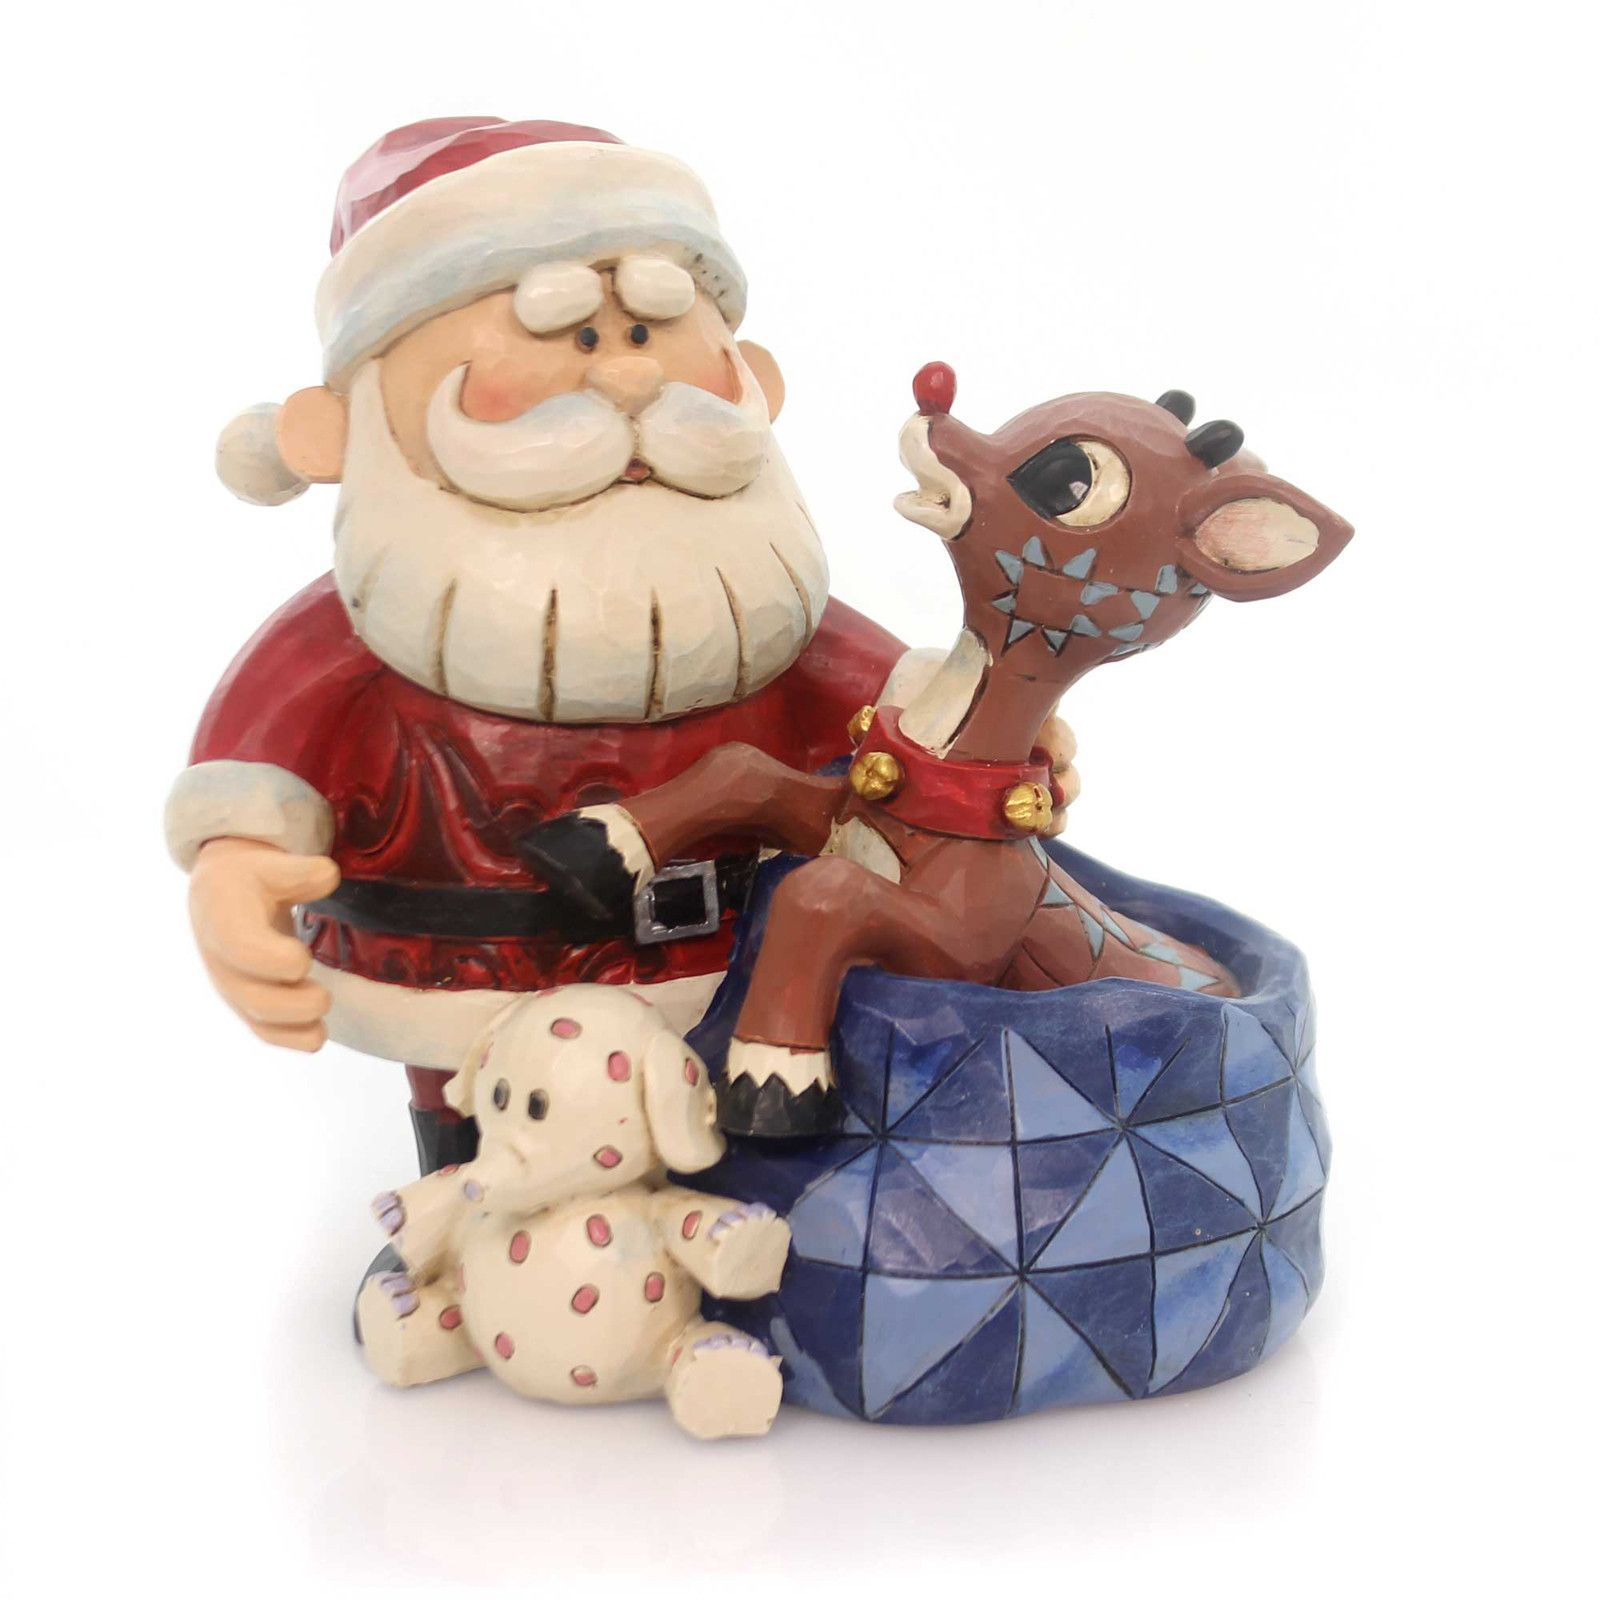 Jim Shore Santa/ Rudolph/ Blinking Nose Christmas Figurine